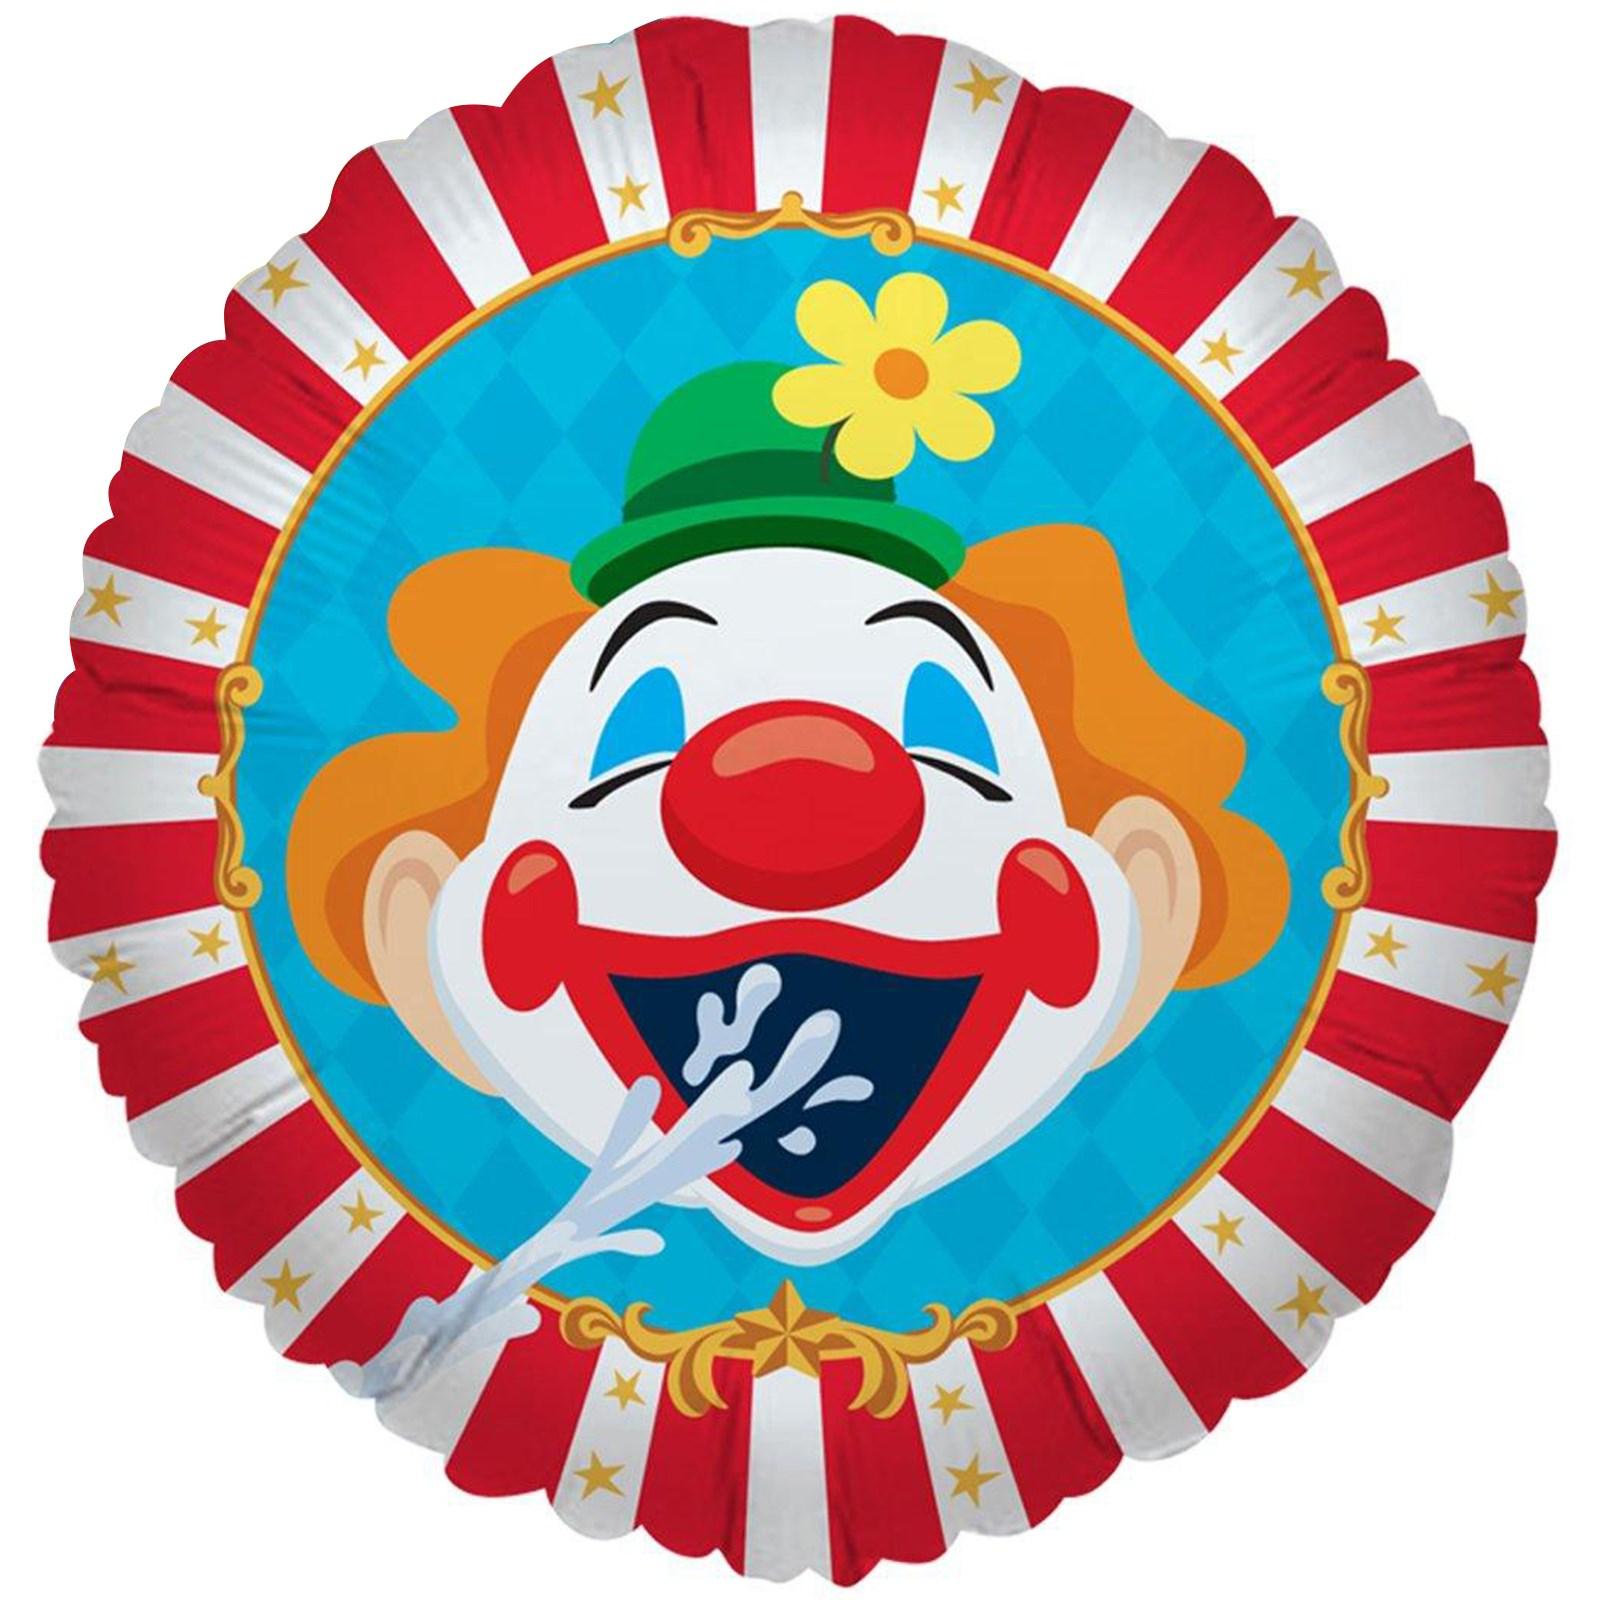 White apron party city - Carnival Games Foil Balloon